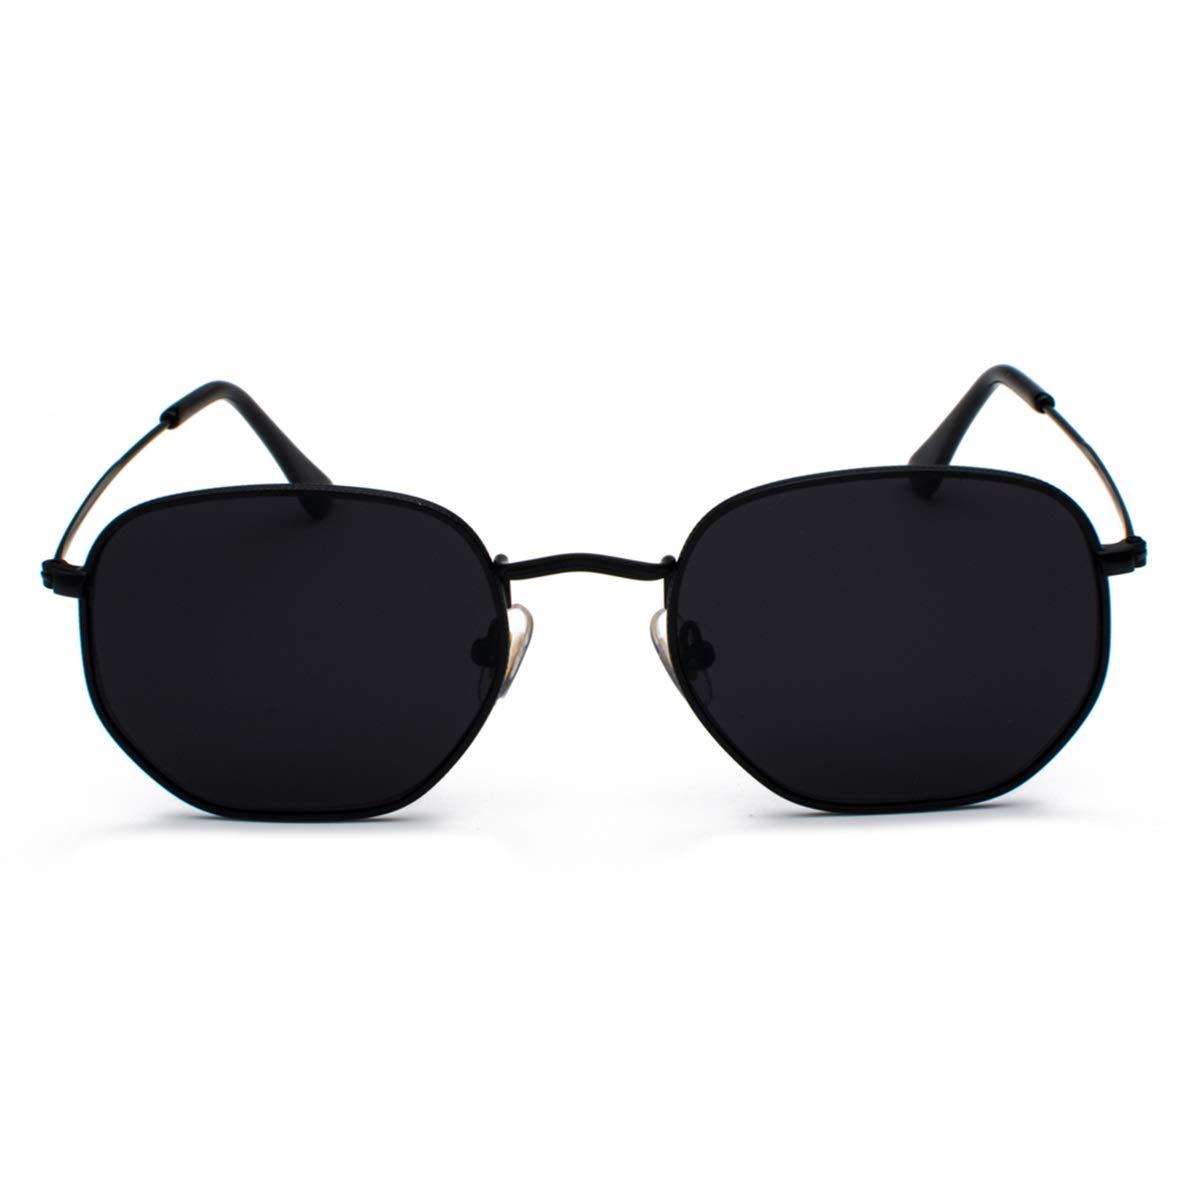 Vintage Gold Sunglasses Unisex Square Metal Frame Silver Brown Black Sun Glasses